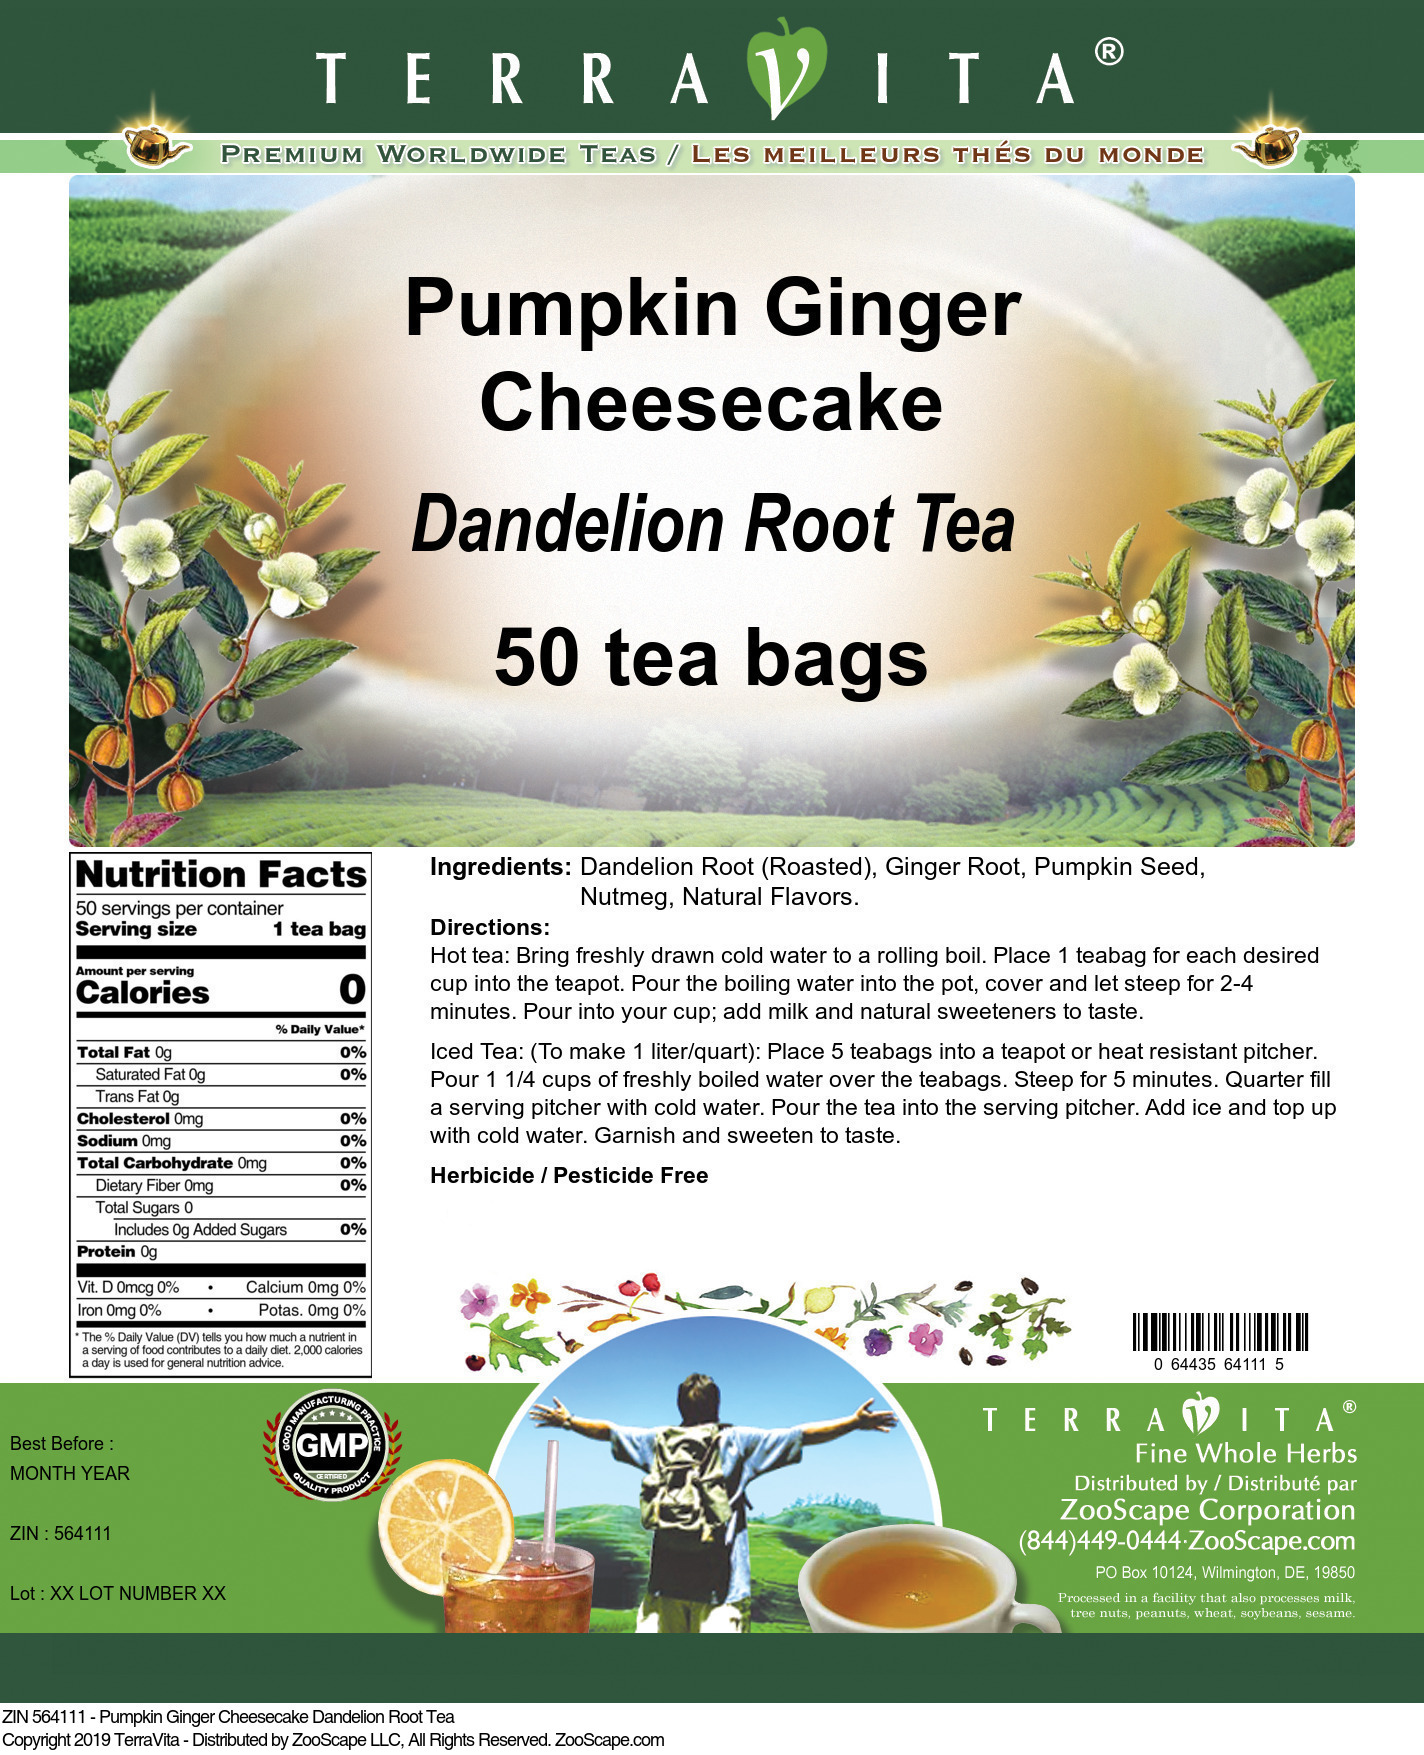 Pumpkin Ginger Cheesecake Dandelion Root